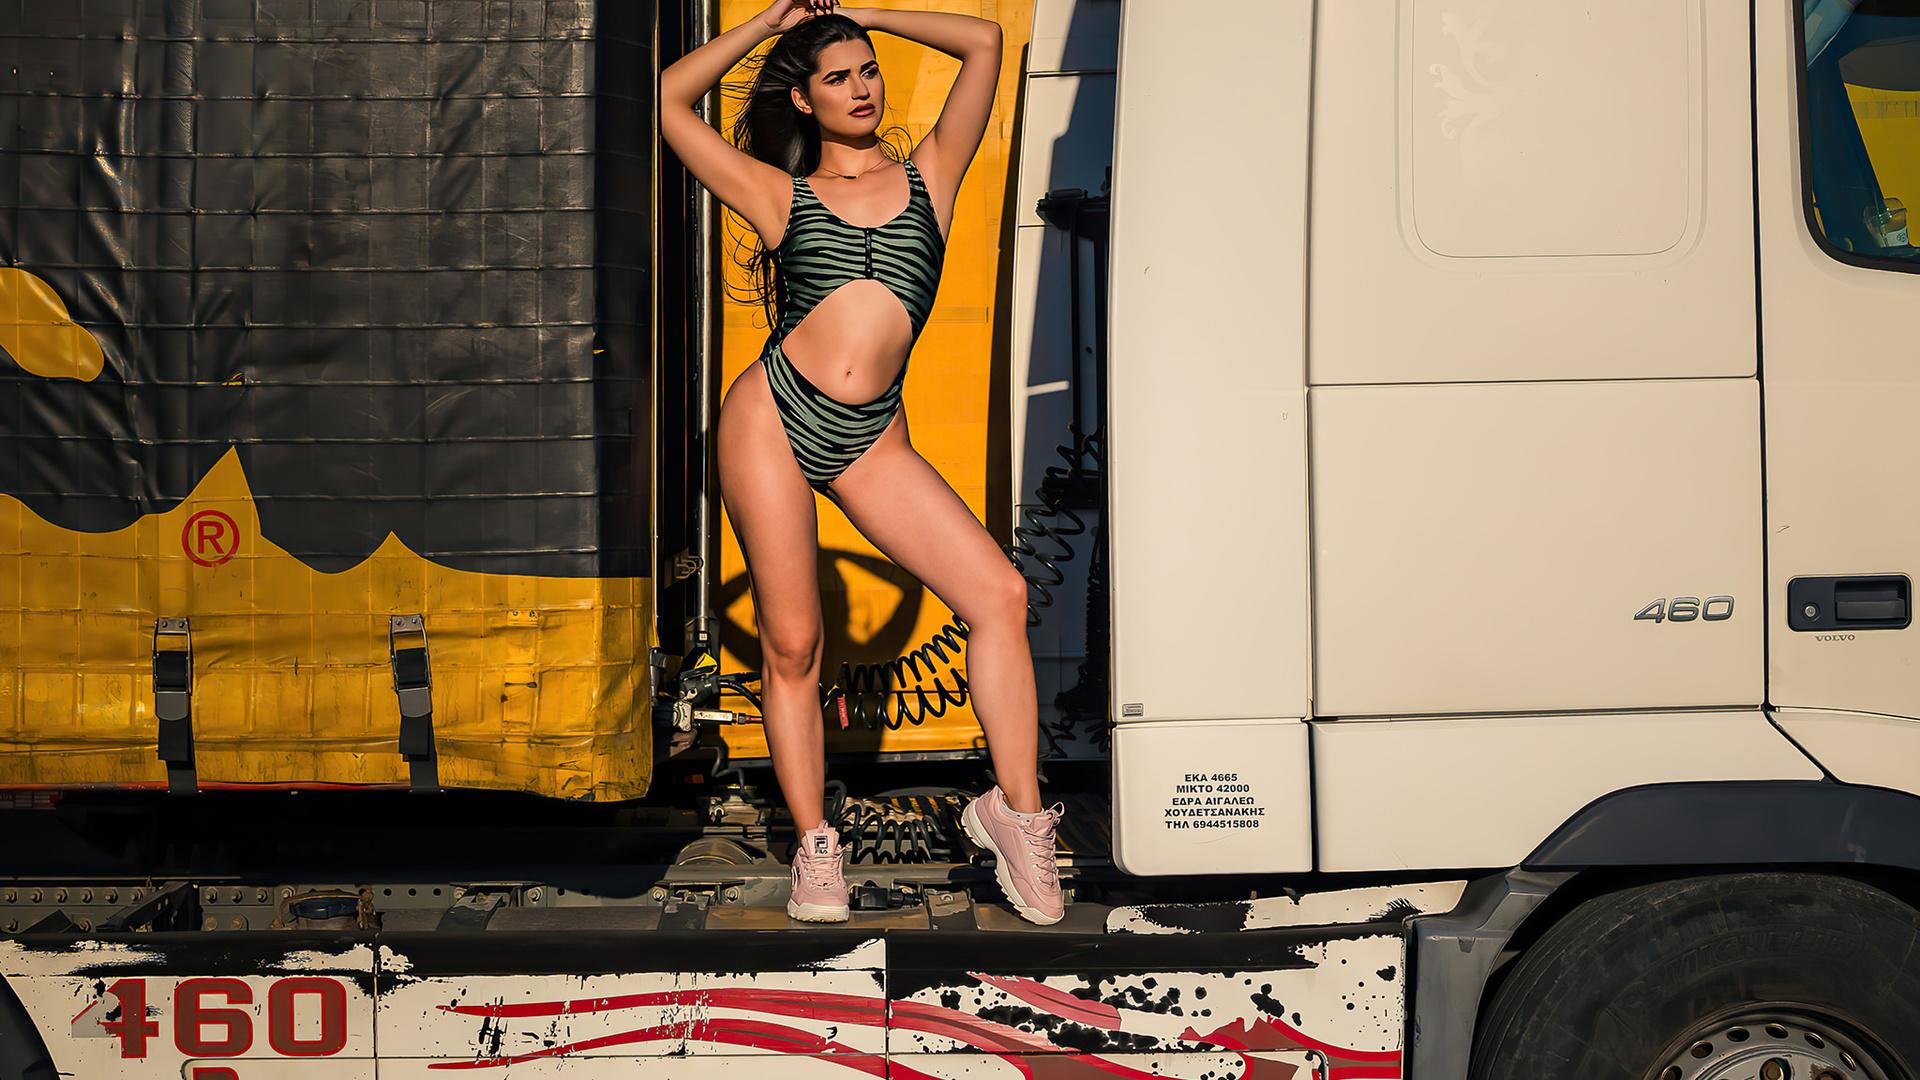 women, swimwear, sneakers, armpits, brunette, arms uplong hair, animal print, truck, belly, women outdoors